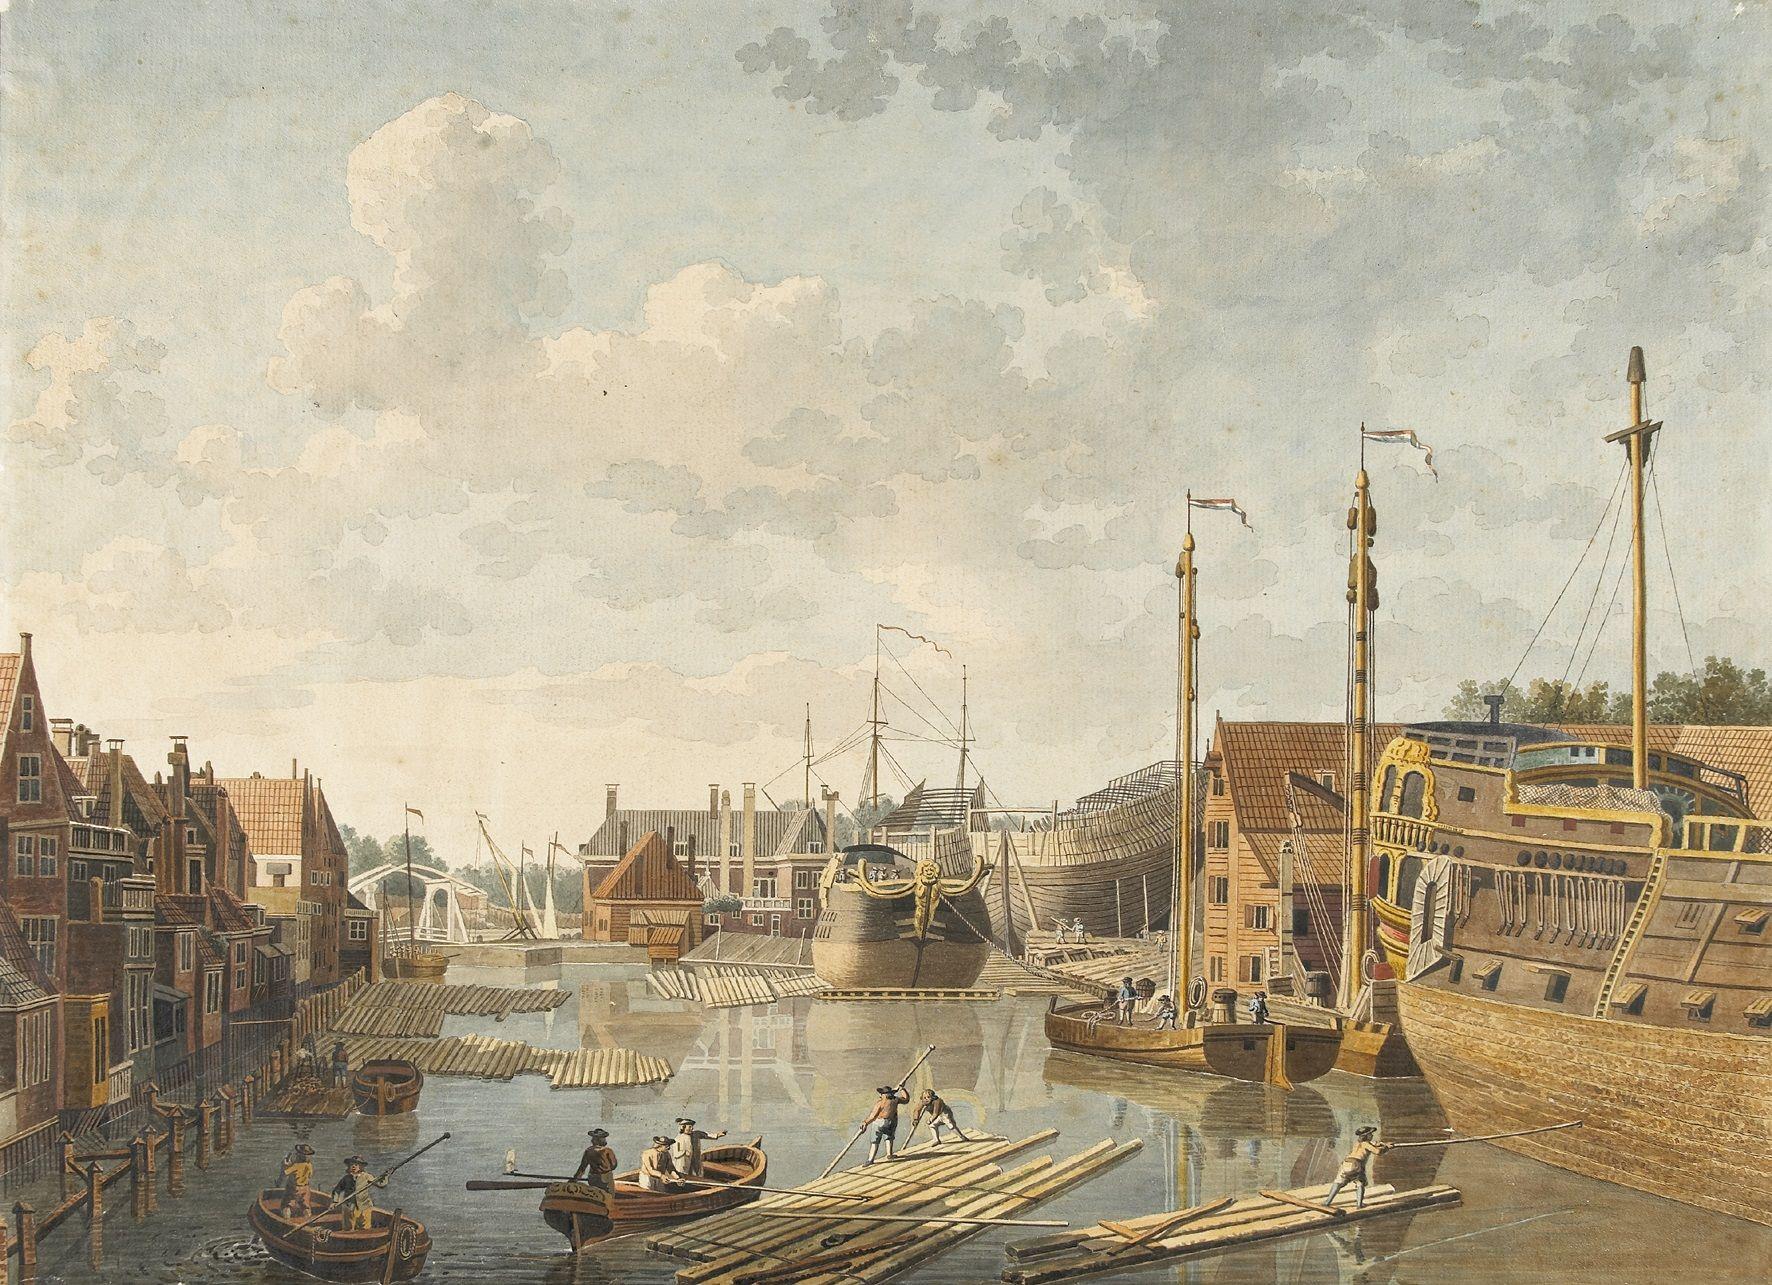 De Middelburgse VOC-werf. Tek. Jan Arends, 1778. ZA/ZI, Zelandia Illustrata.